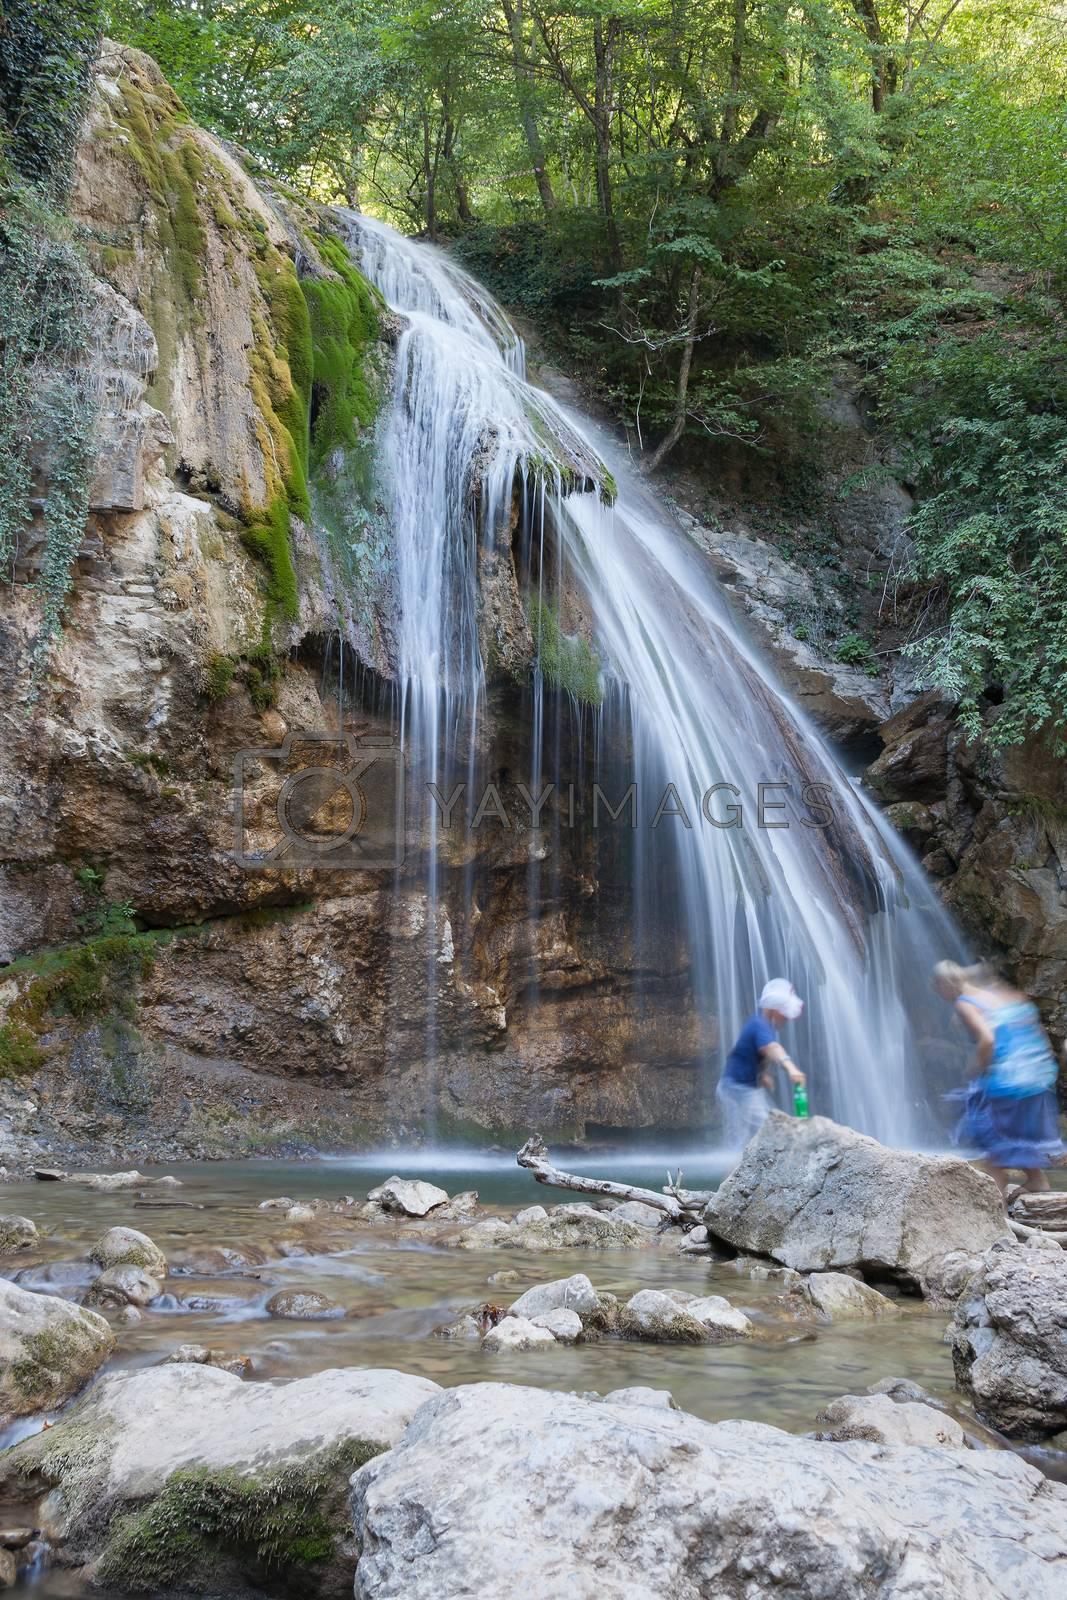 beautiful big falls Dzhur-Dzhur in the summer afternoon, Crimea, Russia